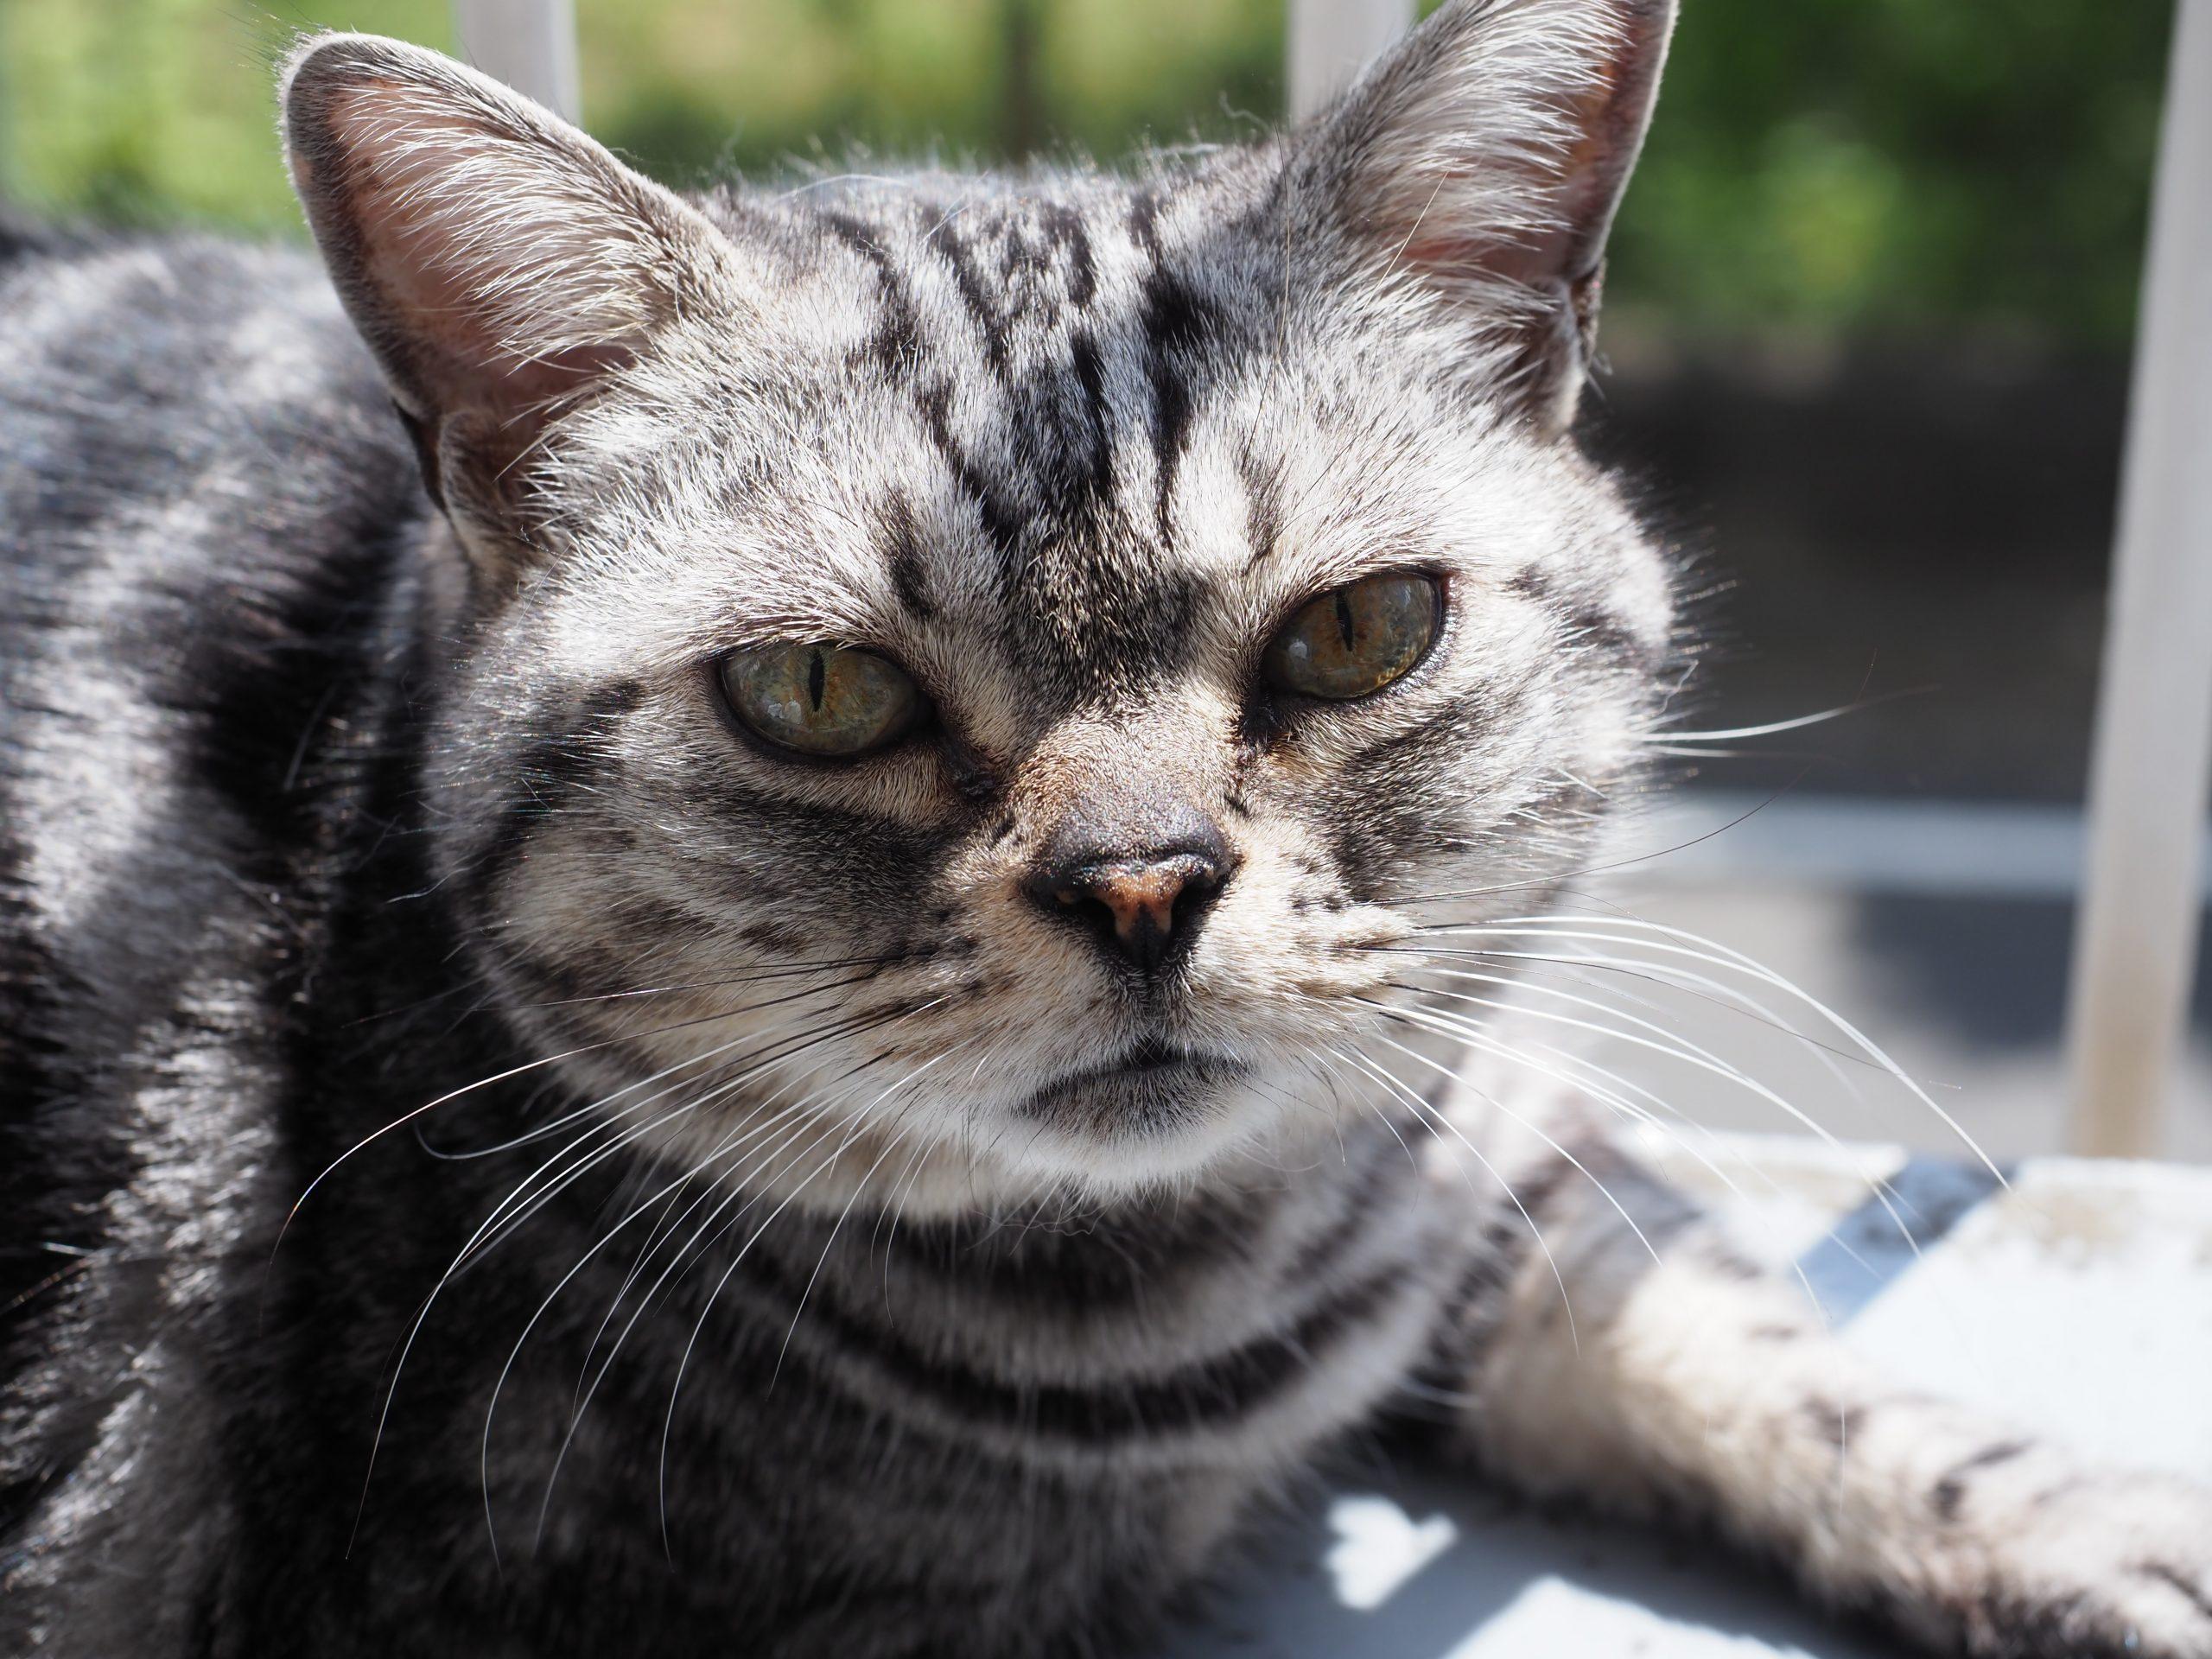 【OLYMPUS】OM-D E-M1 Mark II vs 猫